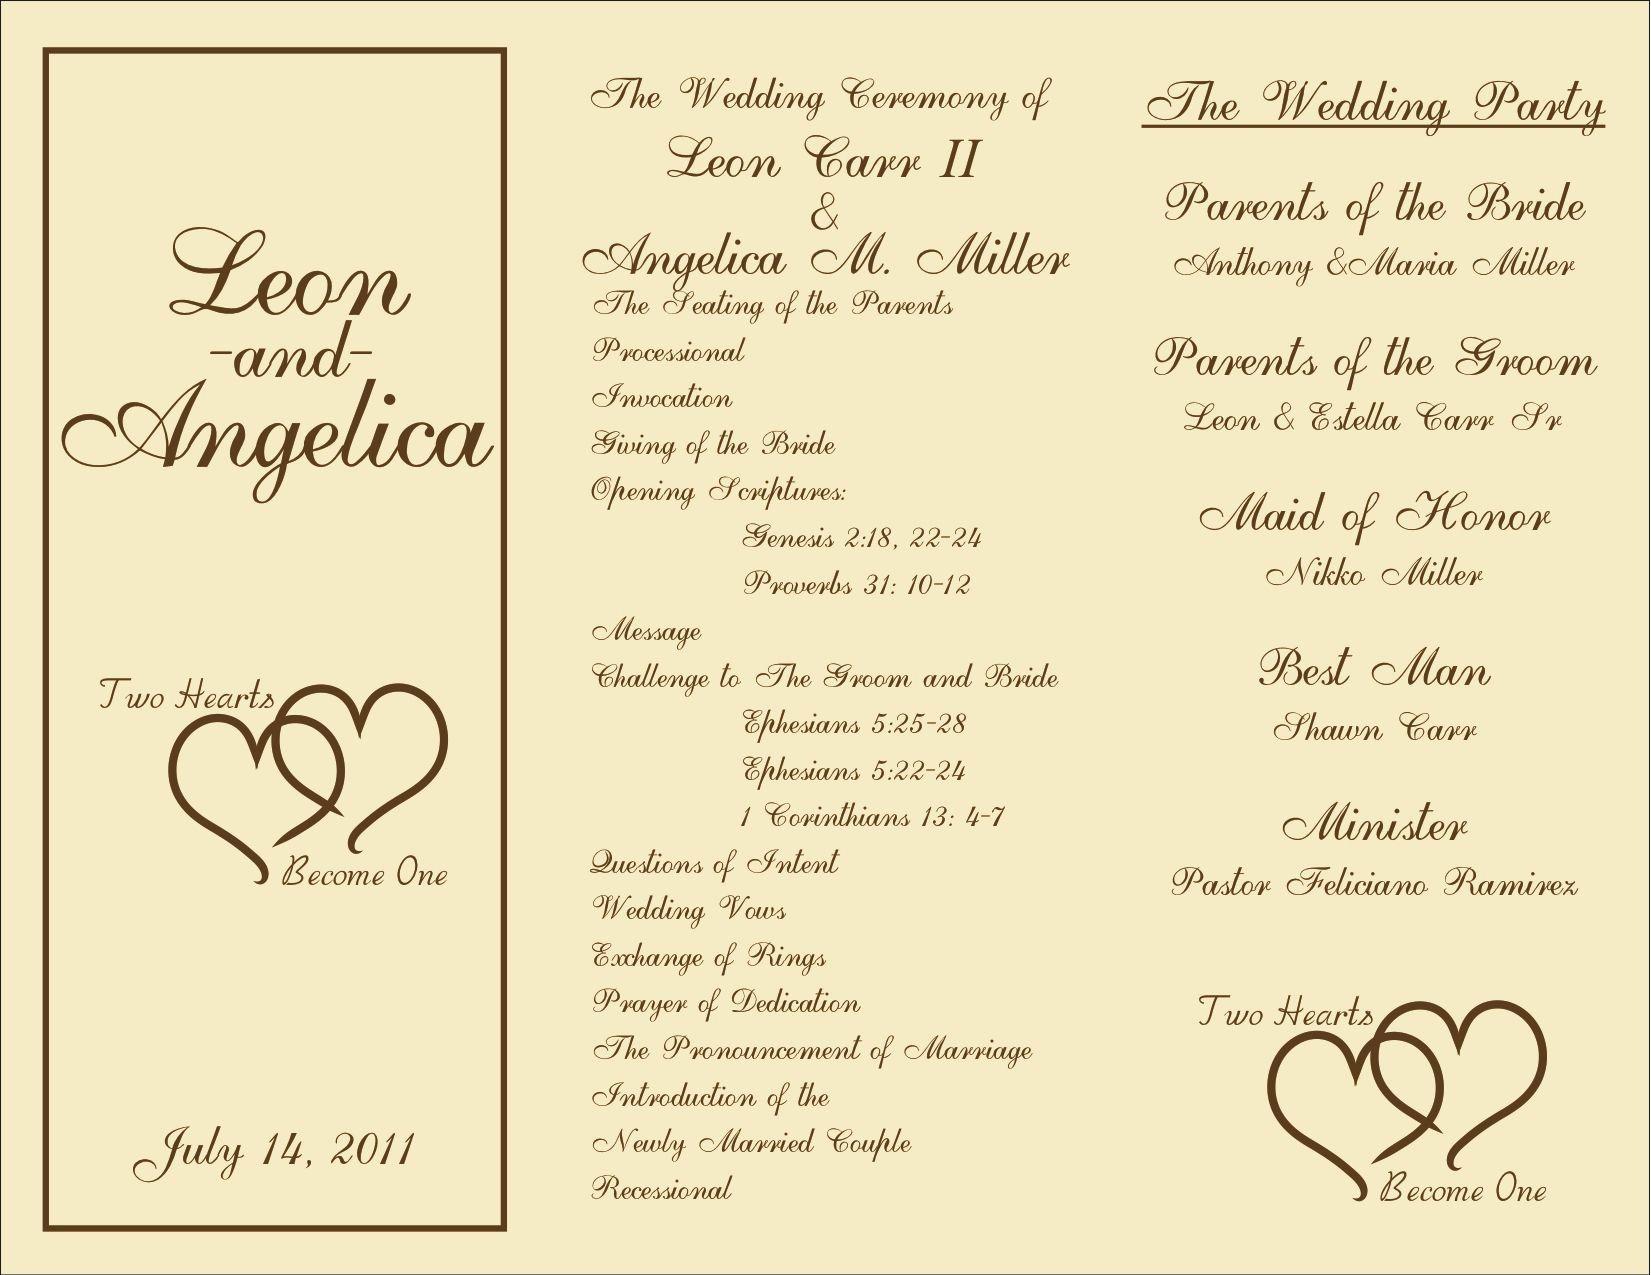 Free Wedding Program Template Downloads New Free Printable Wedding Programs Templates